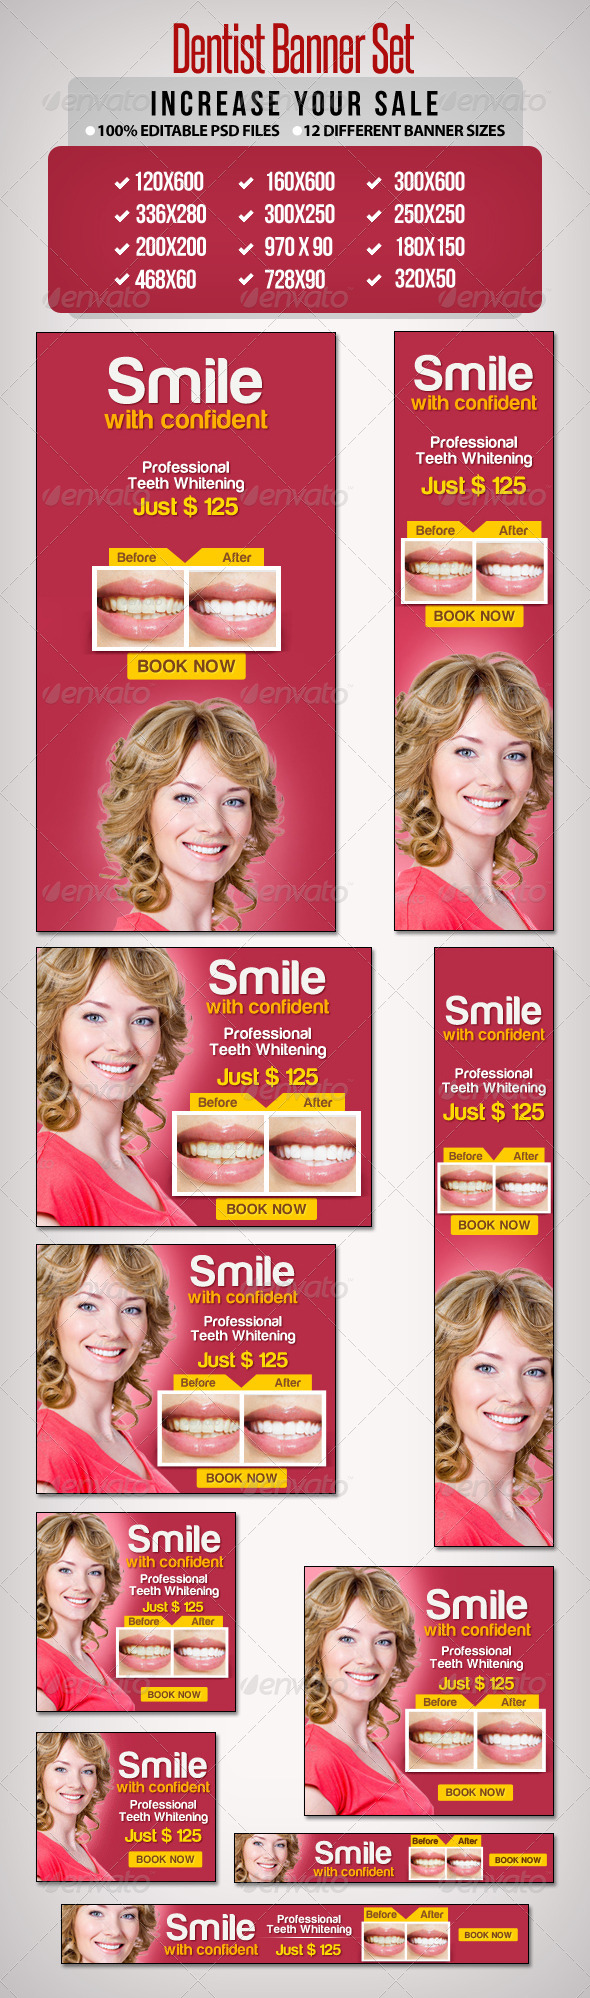 GraphicRiver Dentist Banner Set 6675174